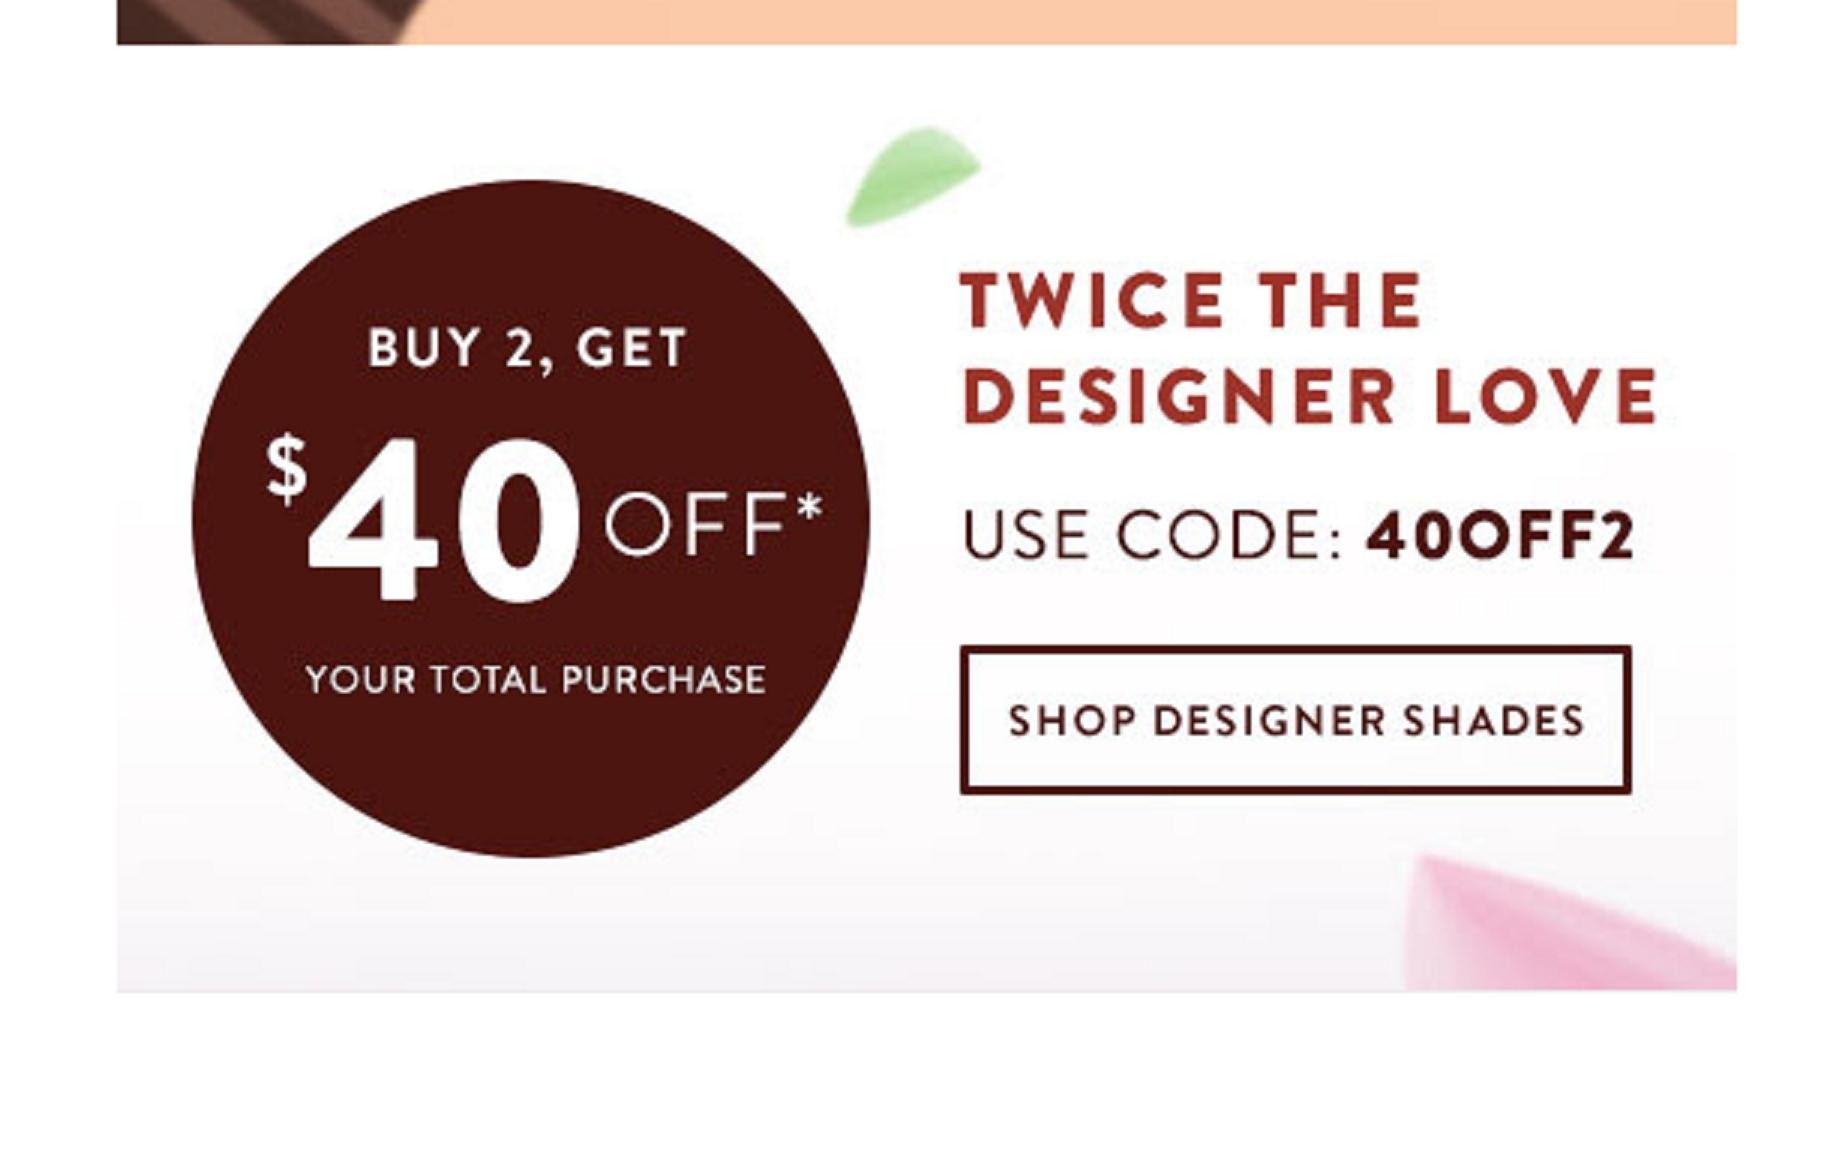 46ad07c6fa005 Sunglass hut coupon 20 off   Thanksgiving deals 2018 amazon